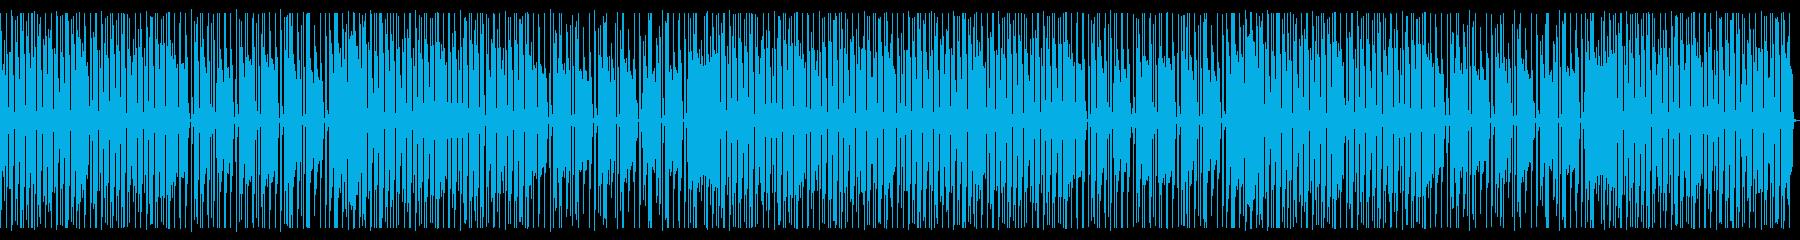 RPGのひょうきんな村のBGMっぽい曲の再生済みの波形